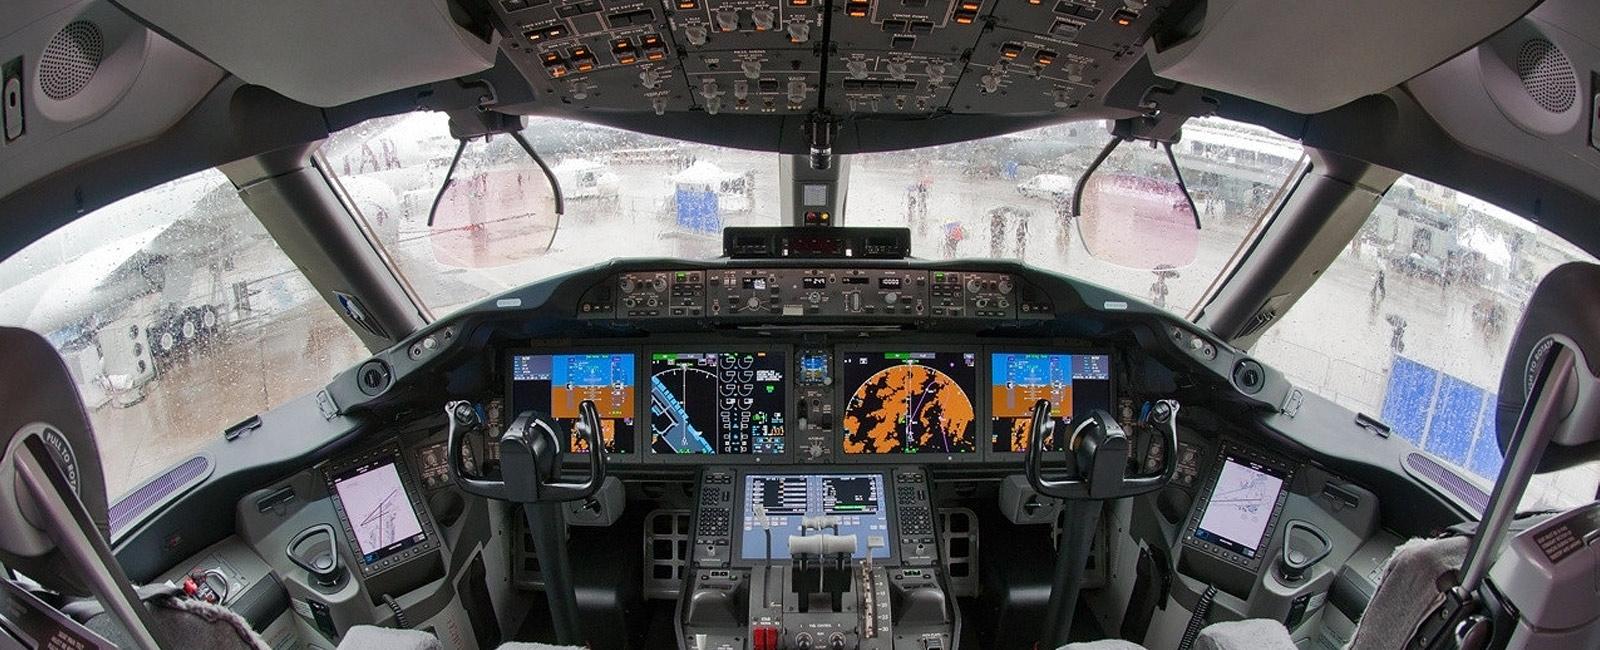 16oct25-kilian-skoogh-03-foto-1-ewas-efb-cockpit